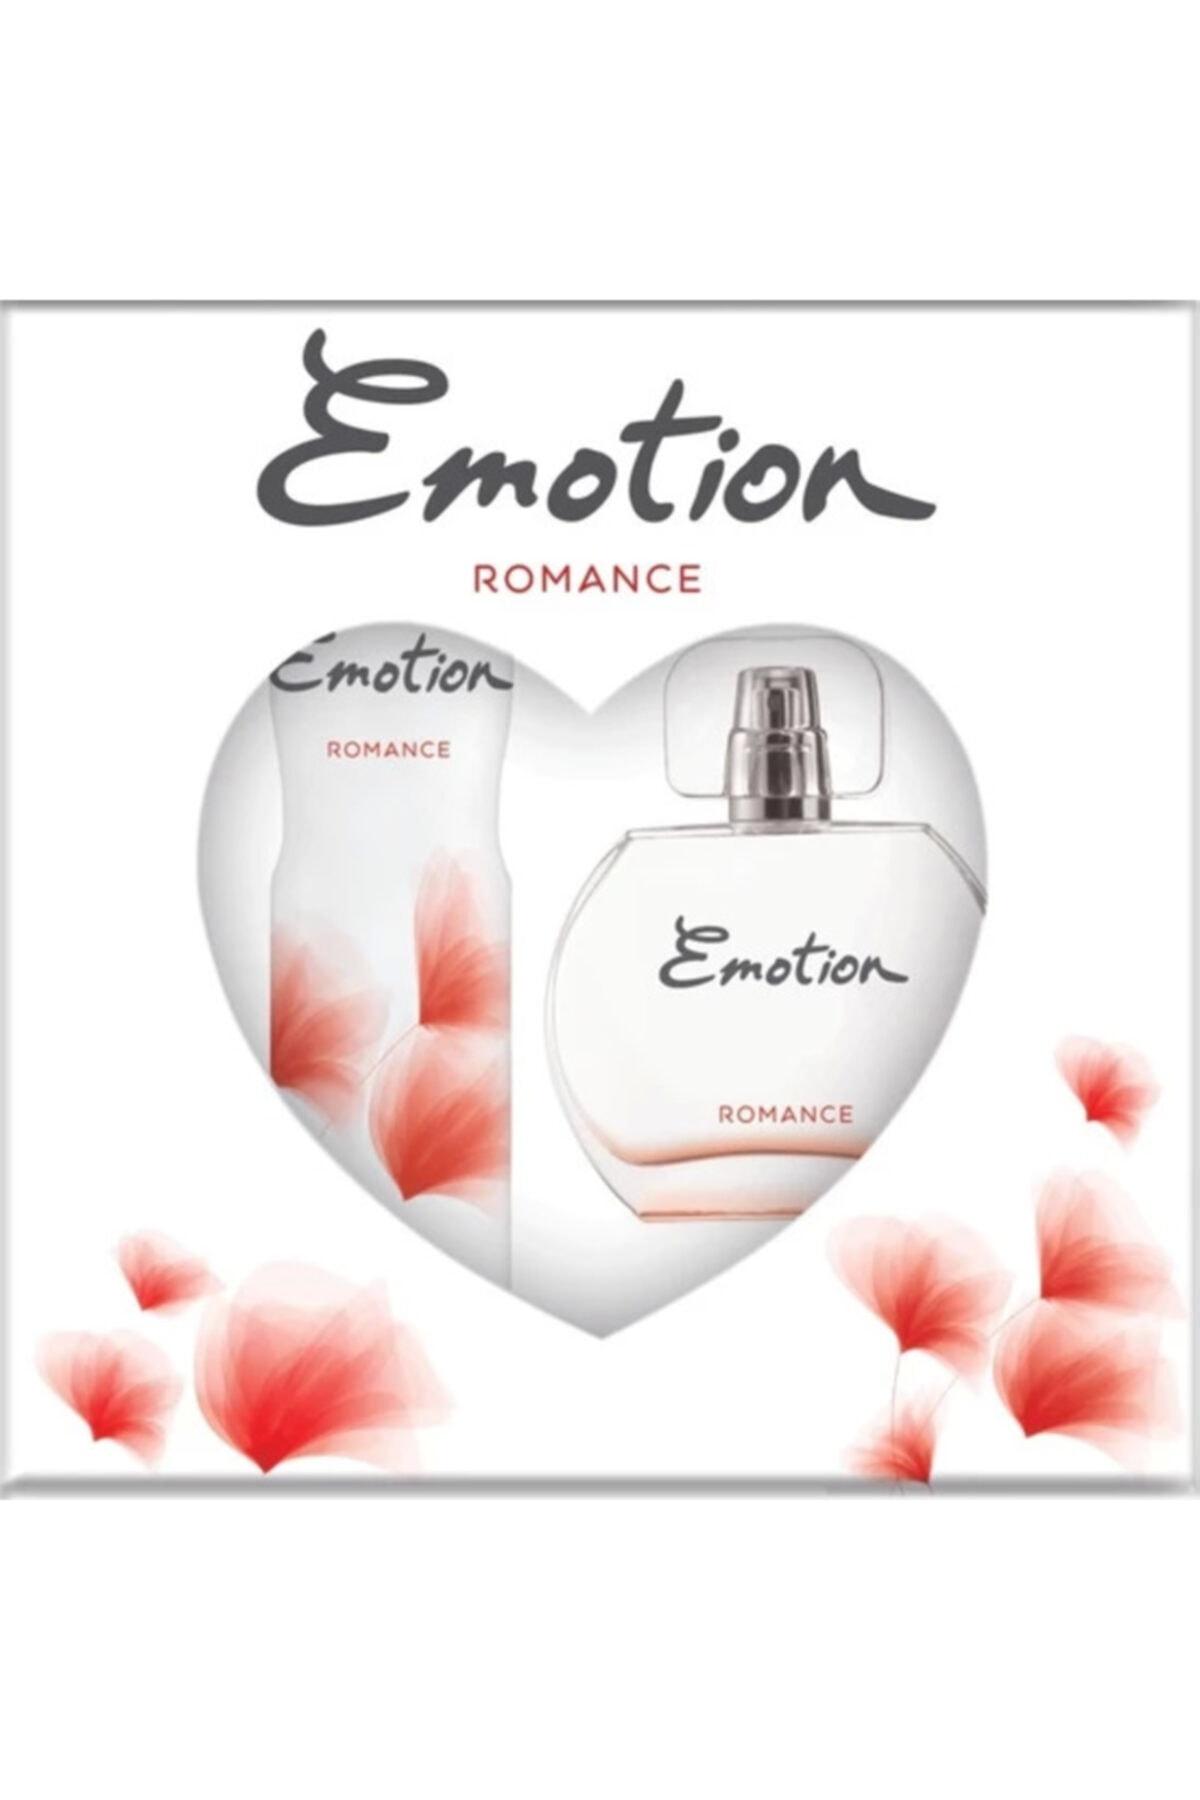 Emotion Romance Bayan Edt 50 Ml + 150 Ml Deodorant Parfüm Seti 2